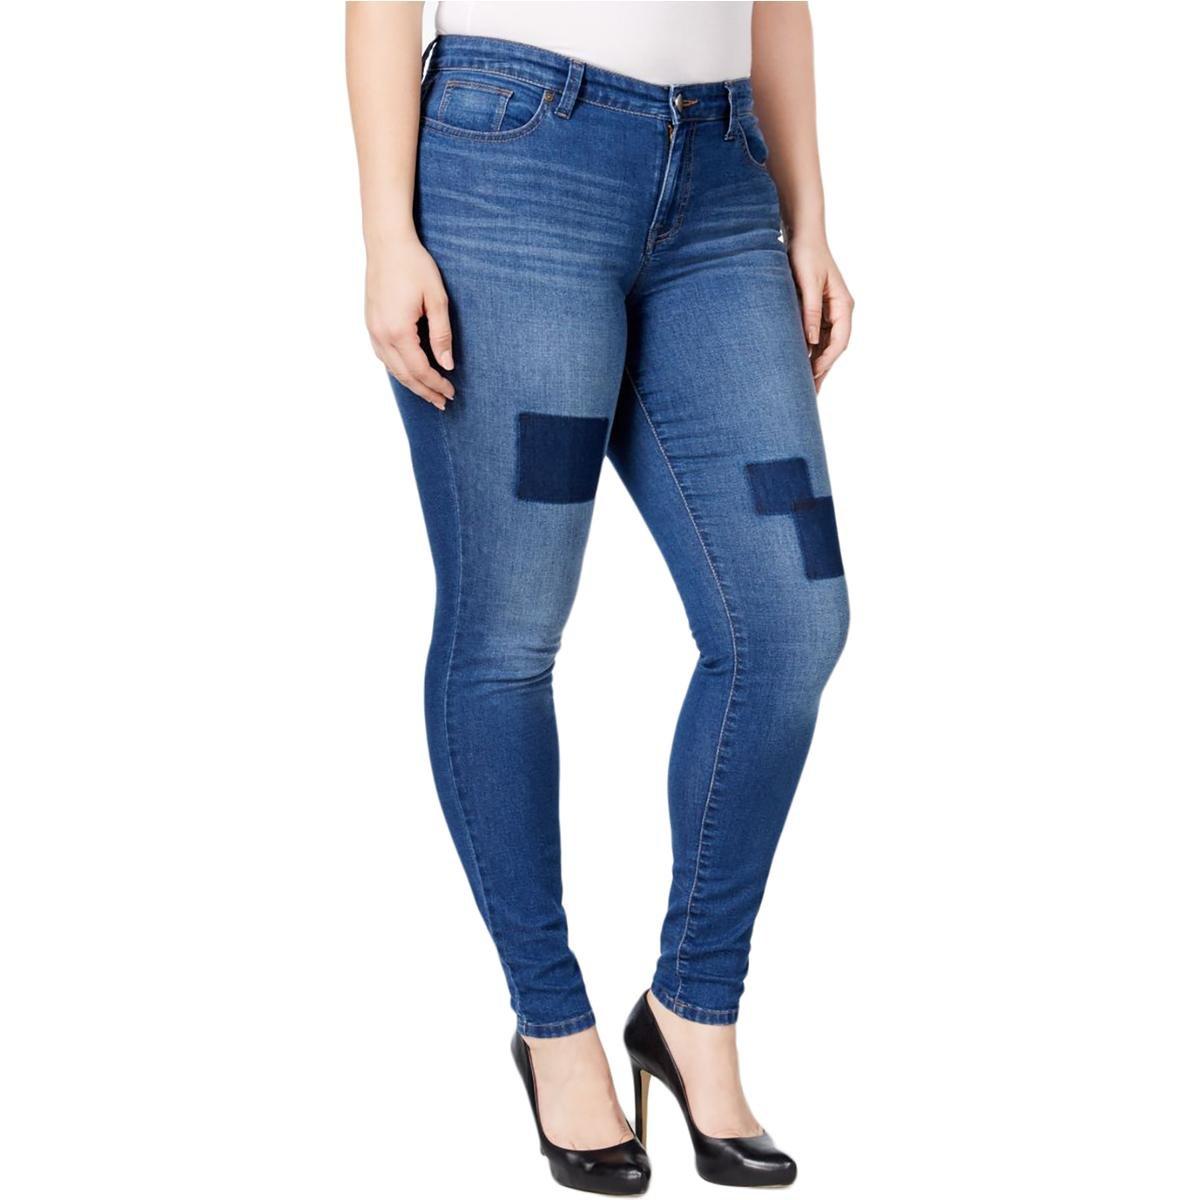 Style & Co. Womens Plus Fiji Slimming Denim Straight Leg Jeans Blue 24W